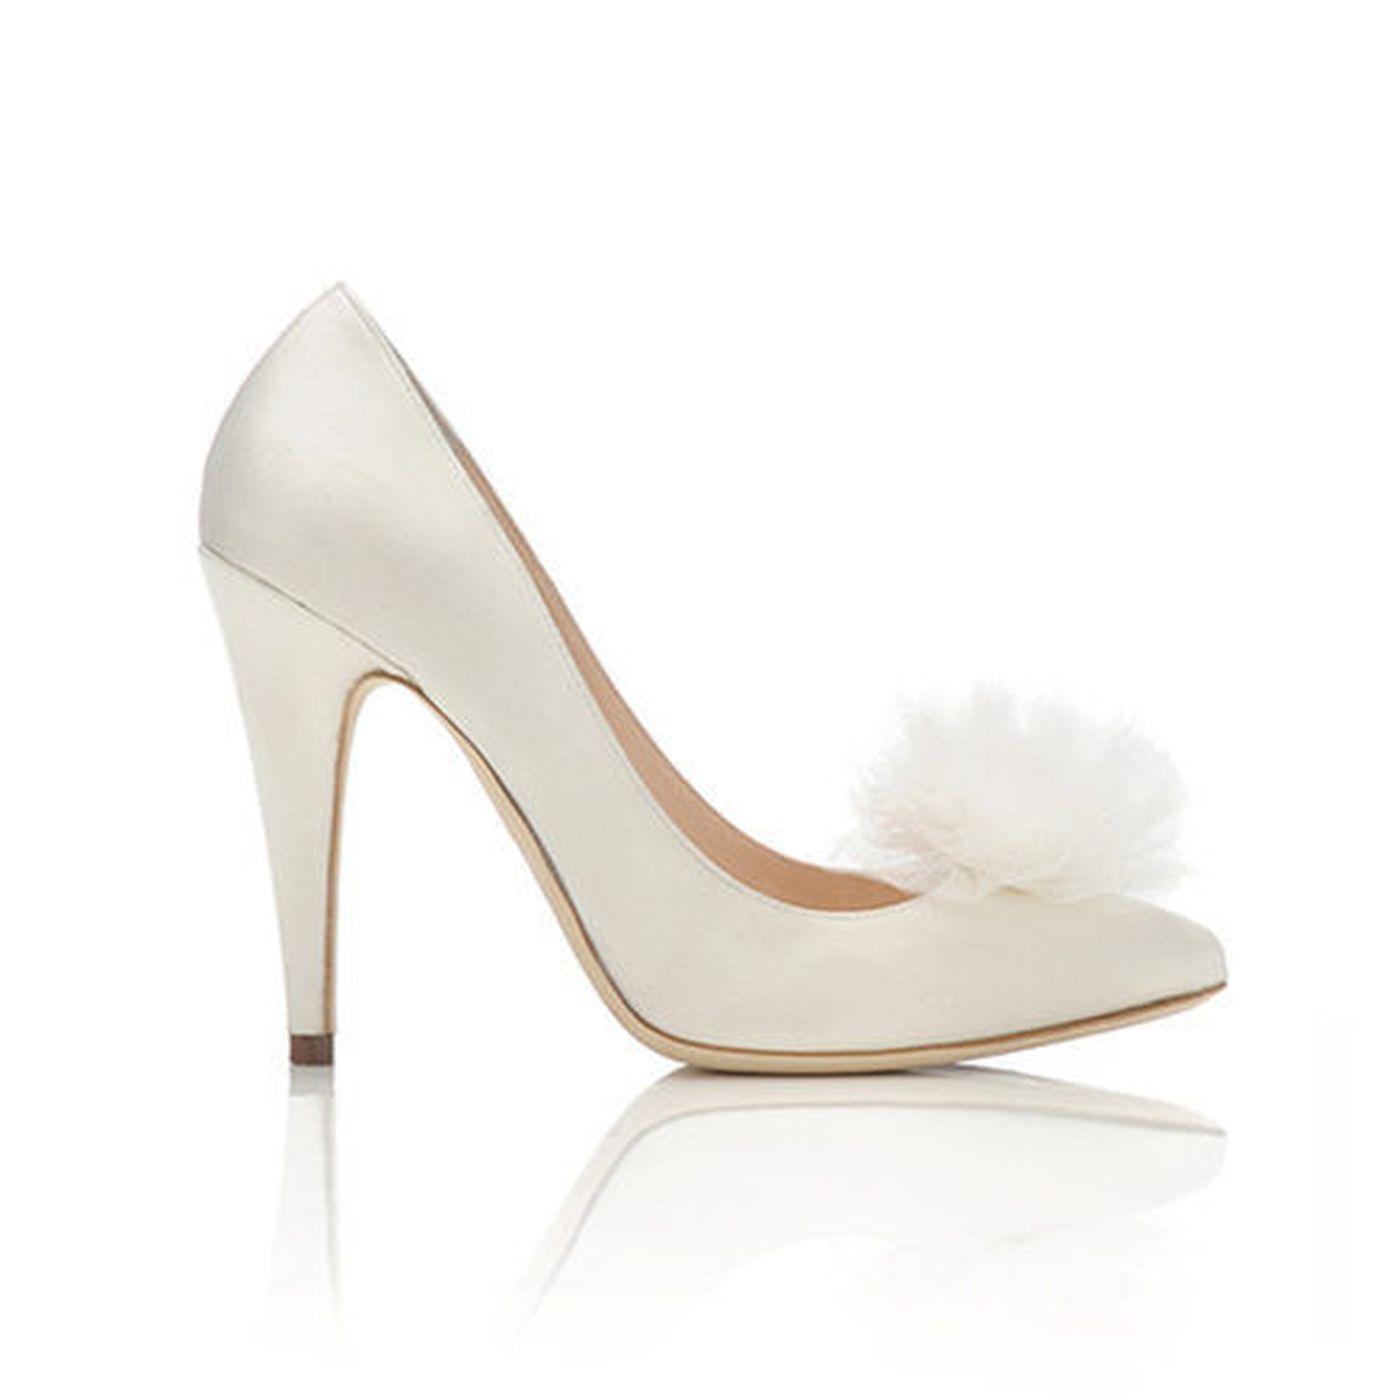 4ca7aafd412a Loeffler Randall Wedding Shoe Sale - Racked